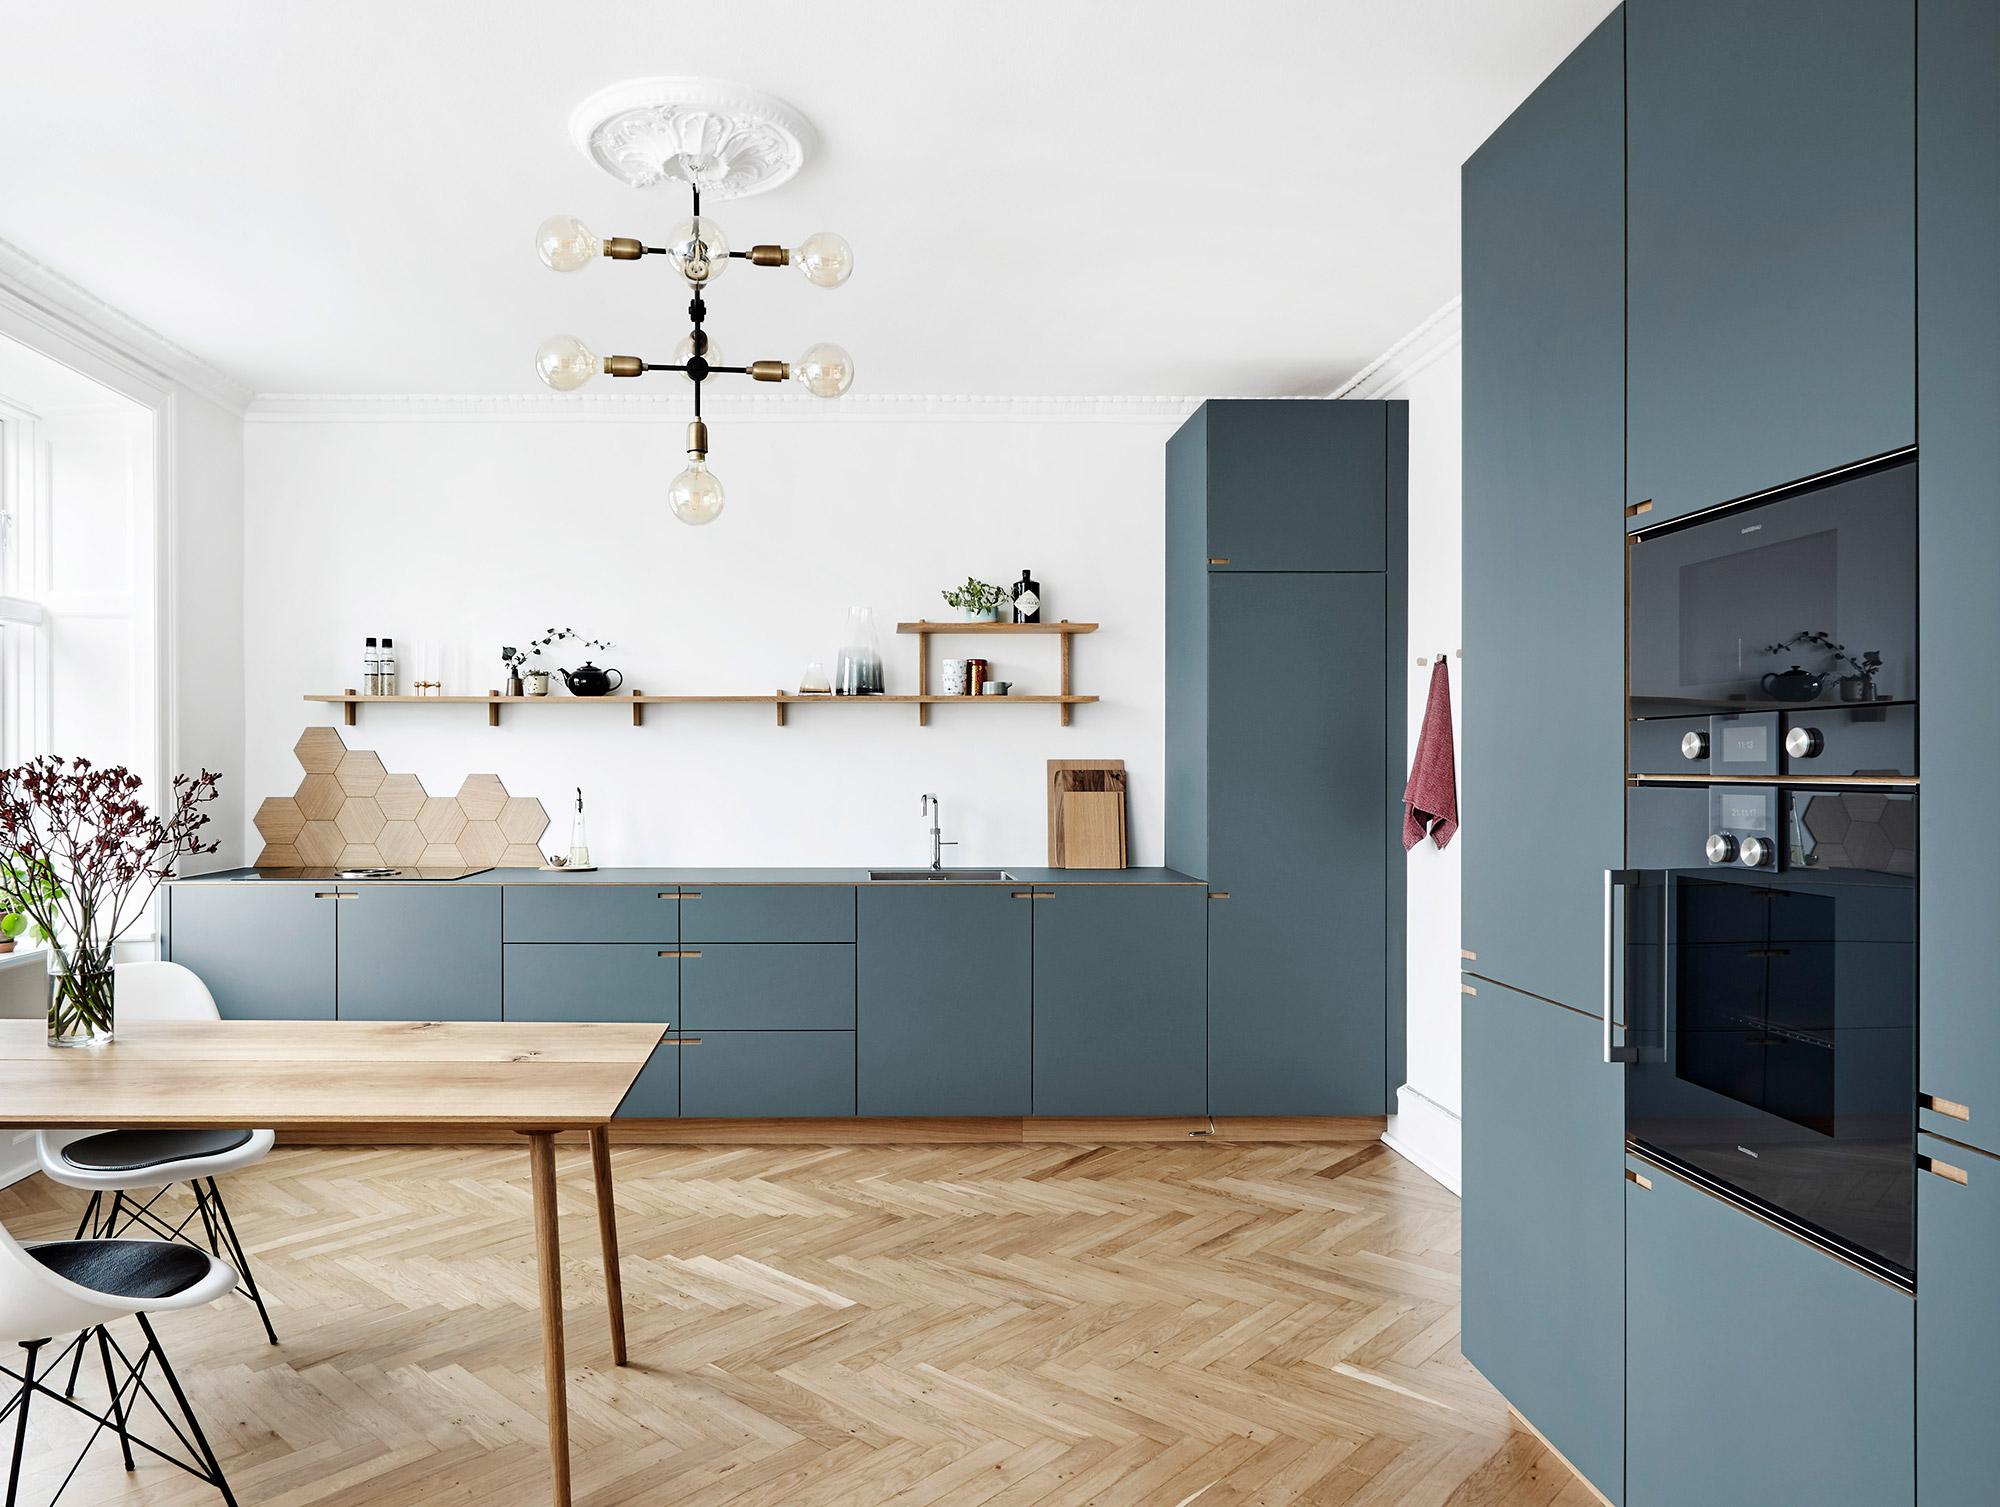 The bespoke kitchen at Øster Søgade, Copenhagen - designet and produced by Nicolaj Bo™